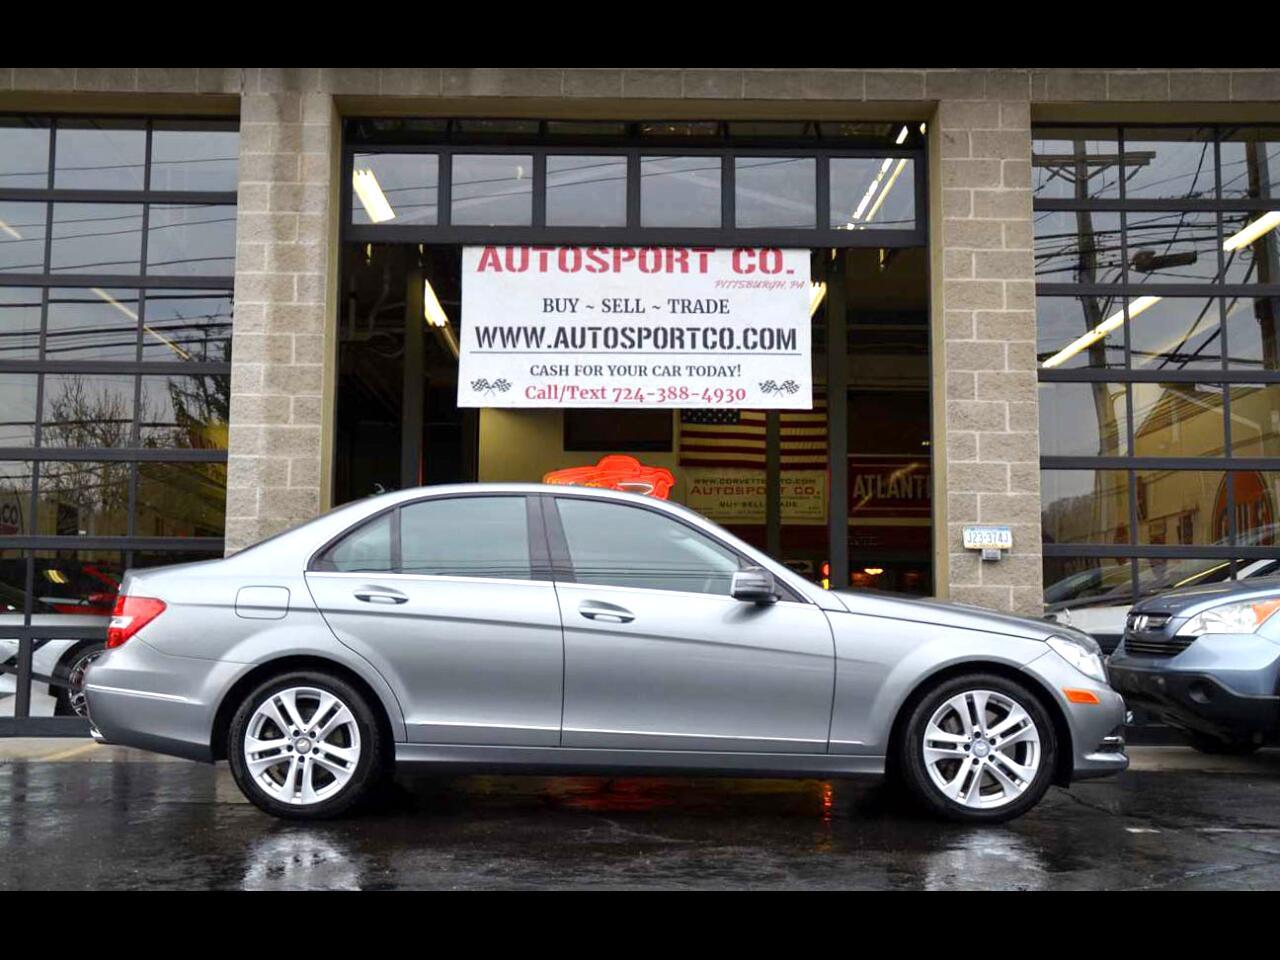 2014 Mercedes-Benz C-Class C300 4MATIC Luxury Sedan